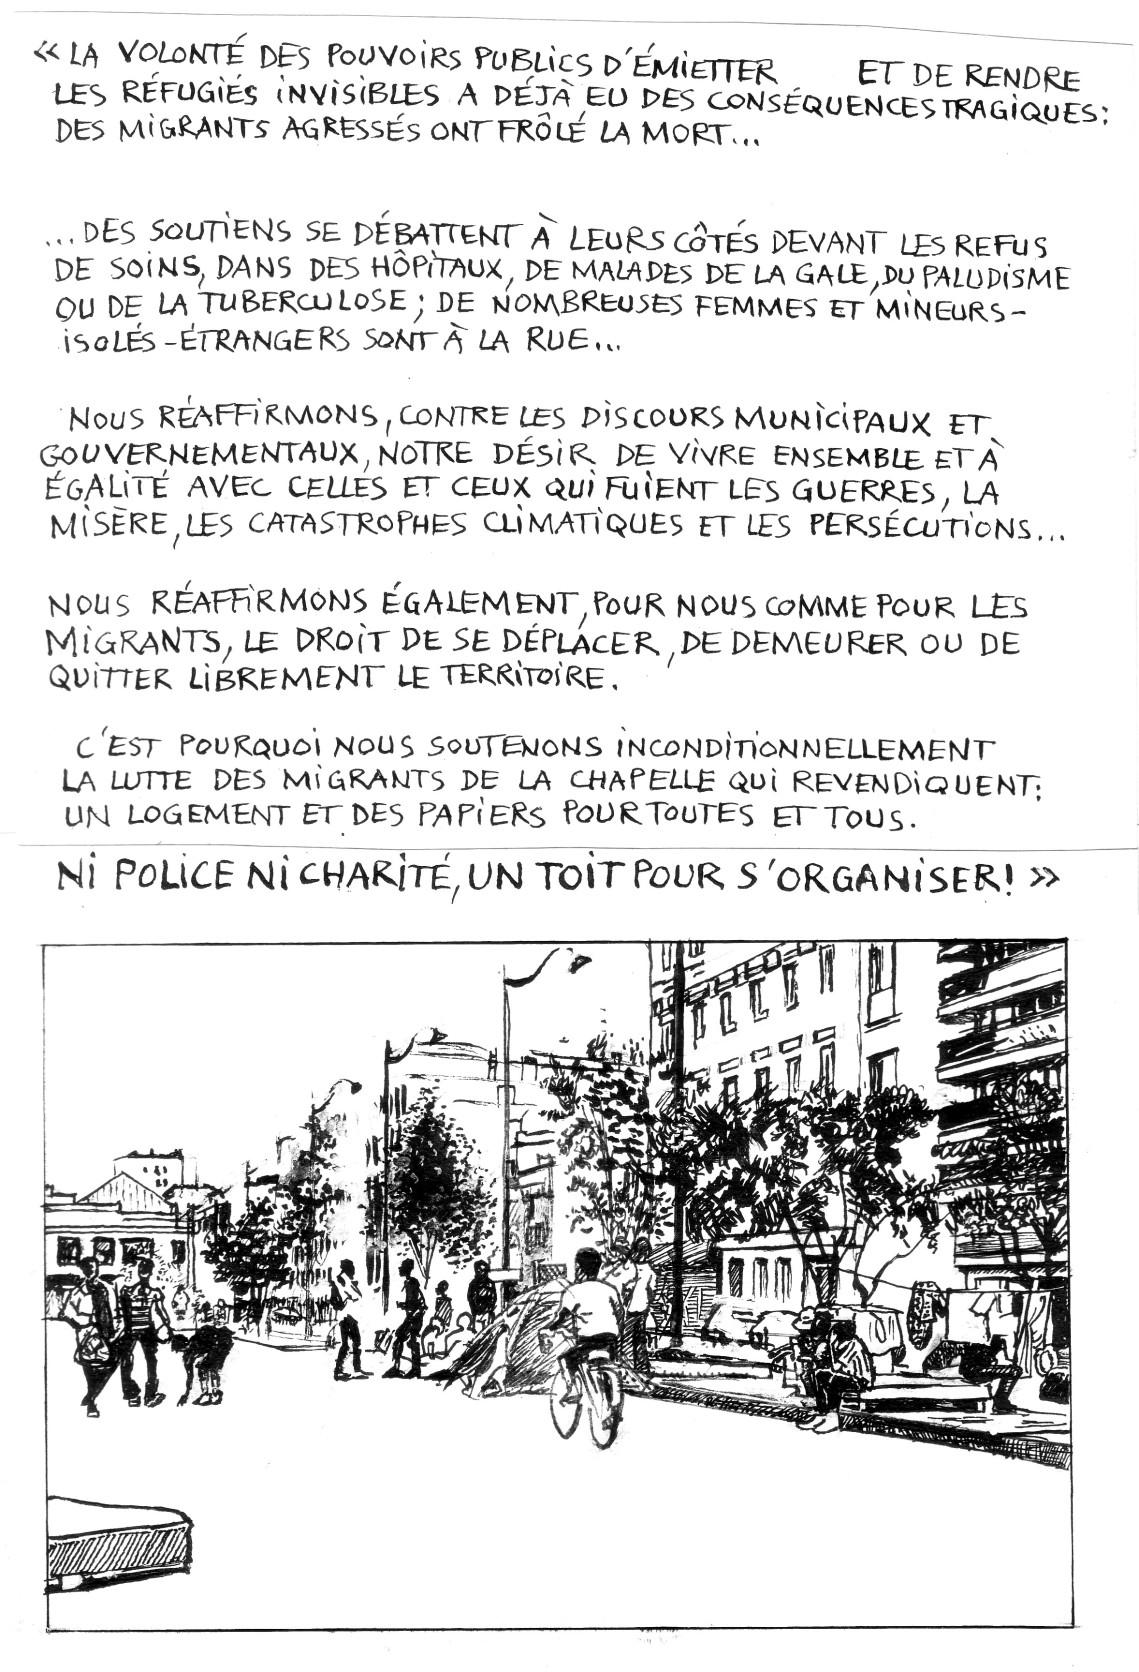 solidarité31.jpg